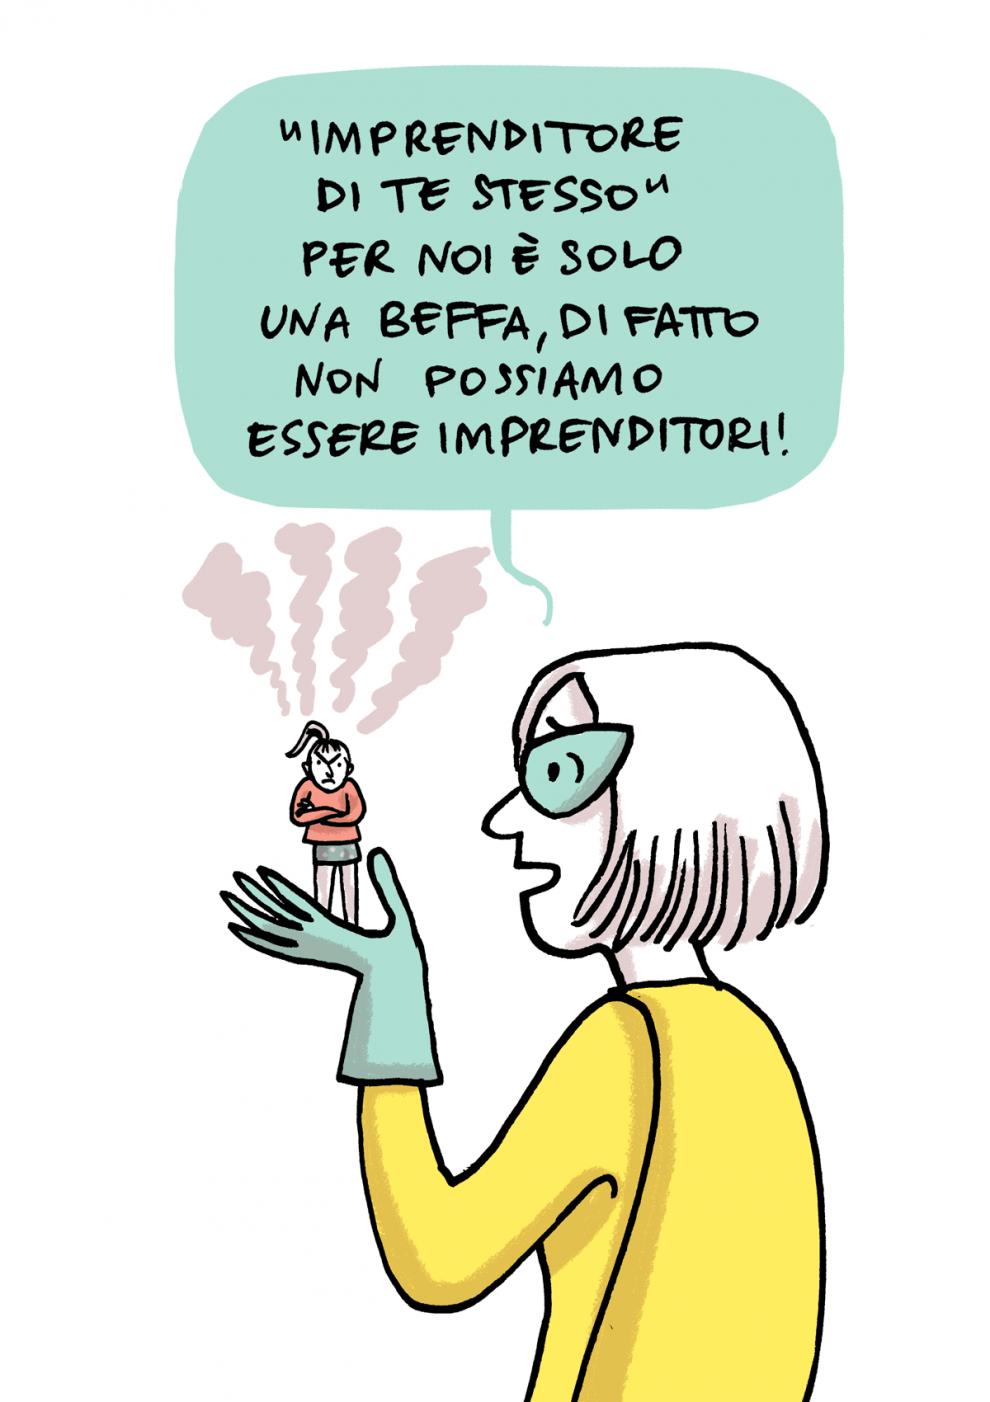 Sagramola